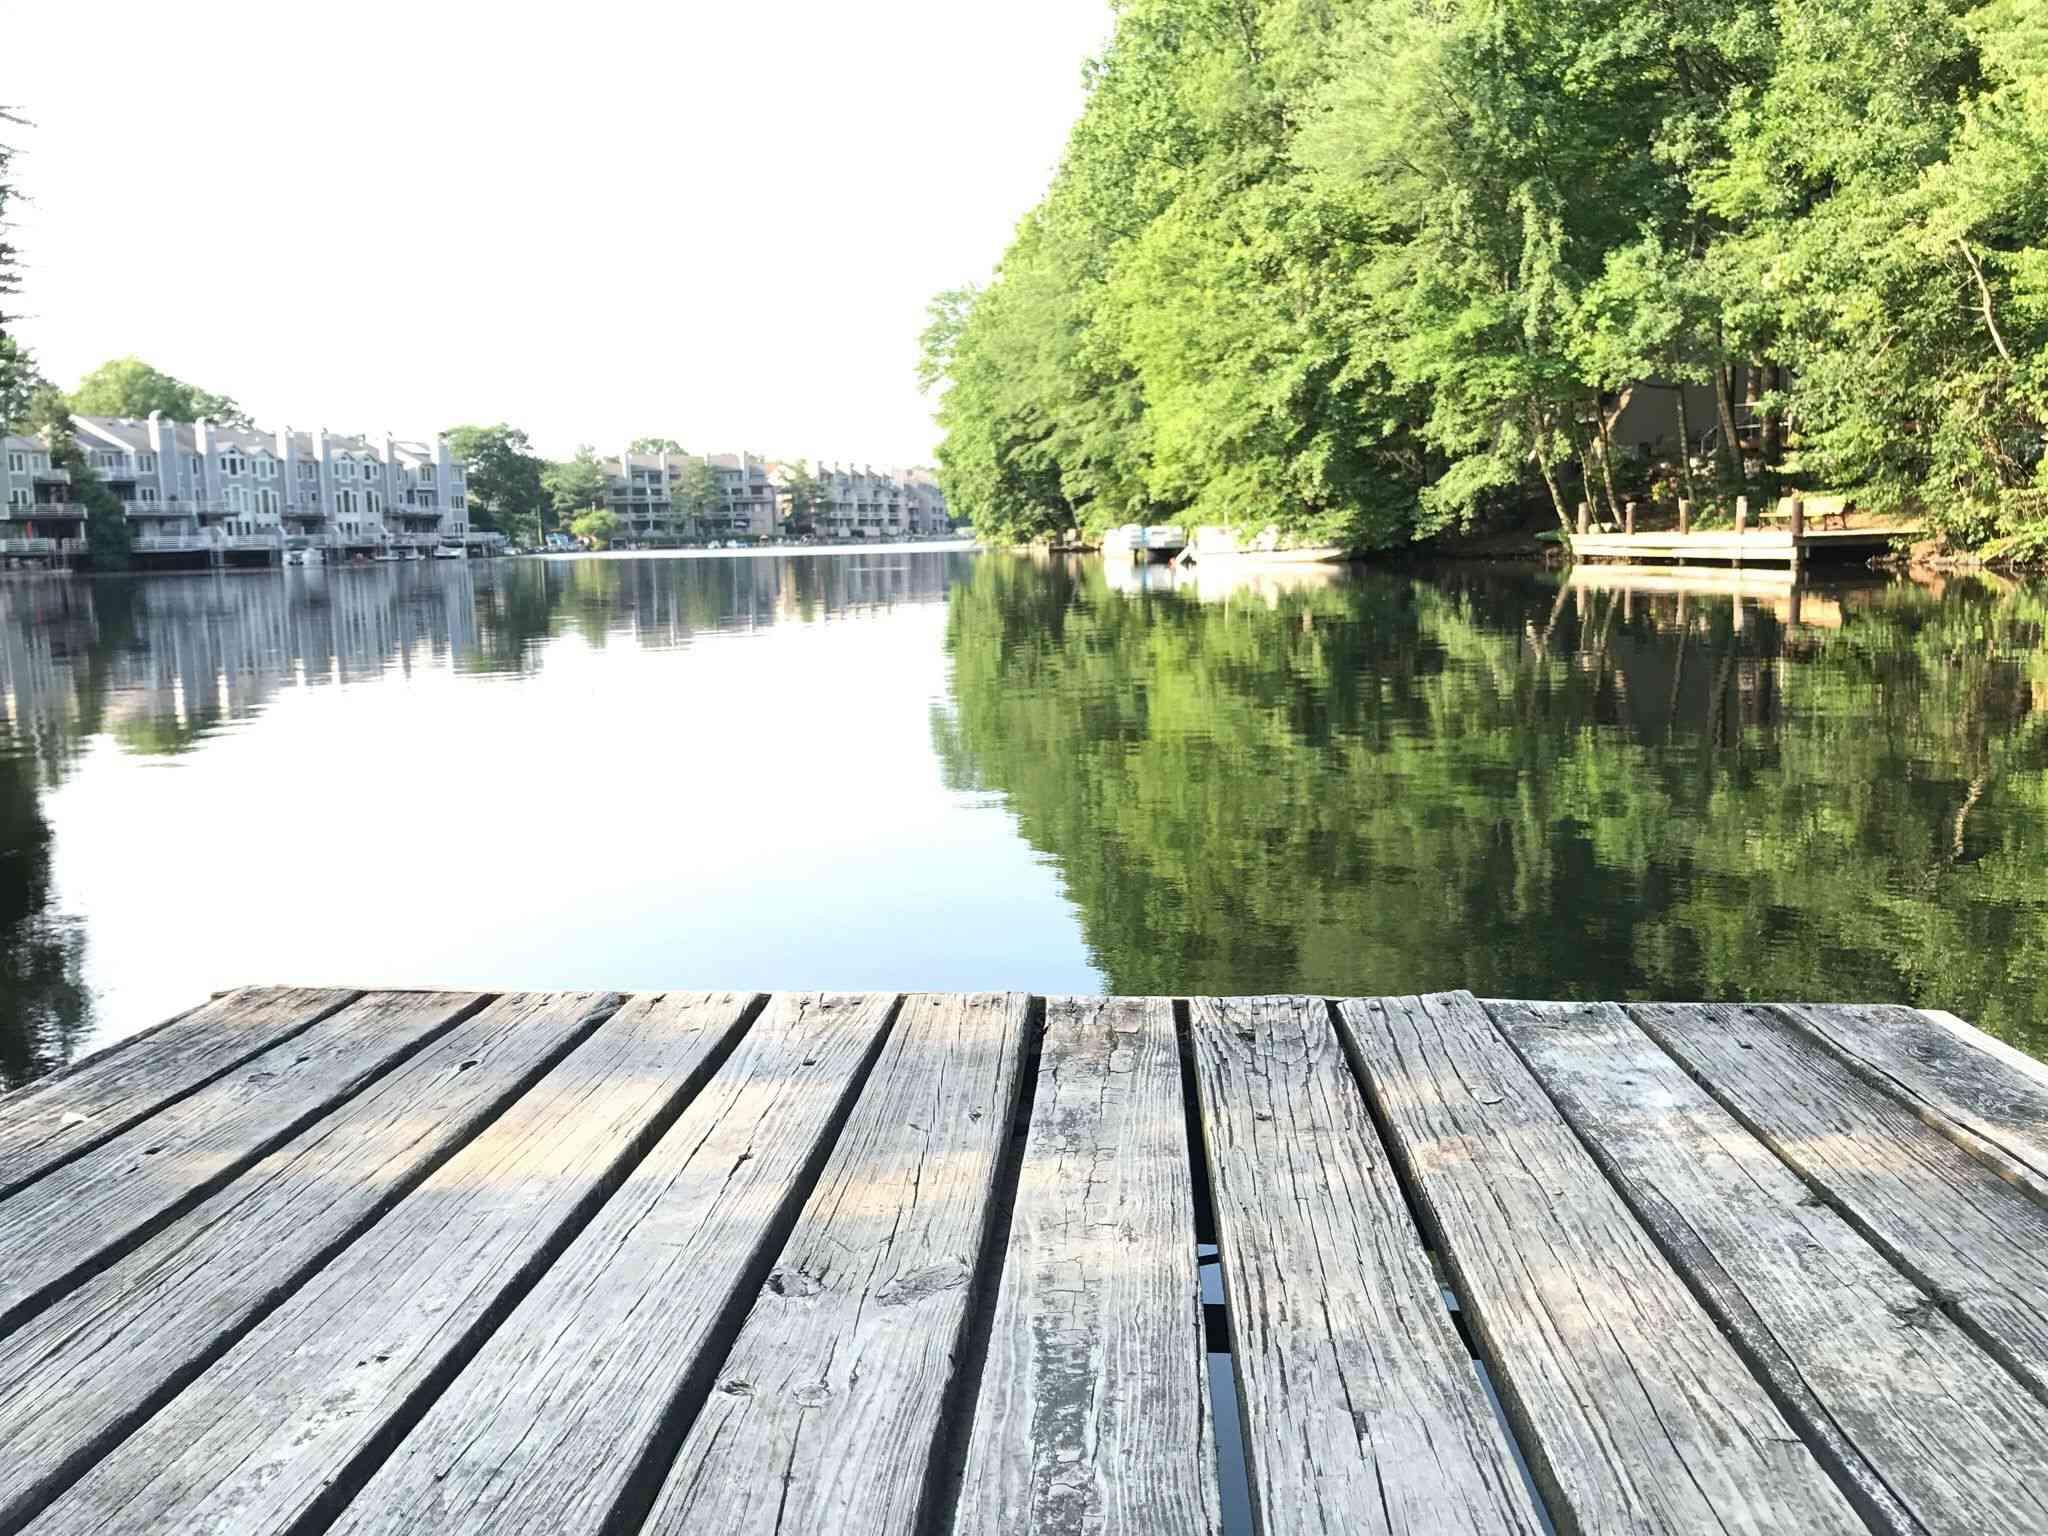 Lake Thoreau Loop Trail